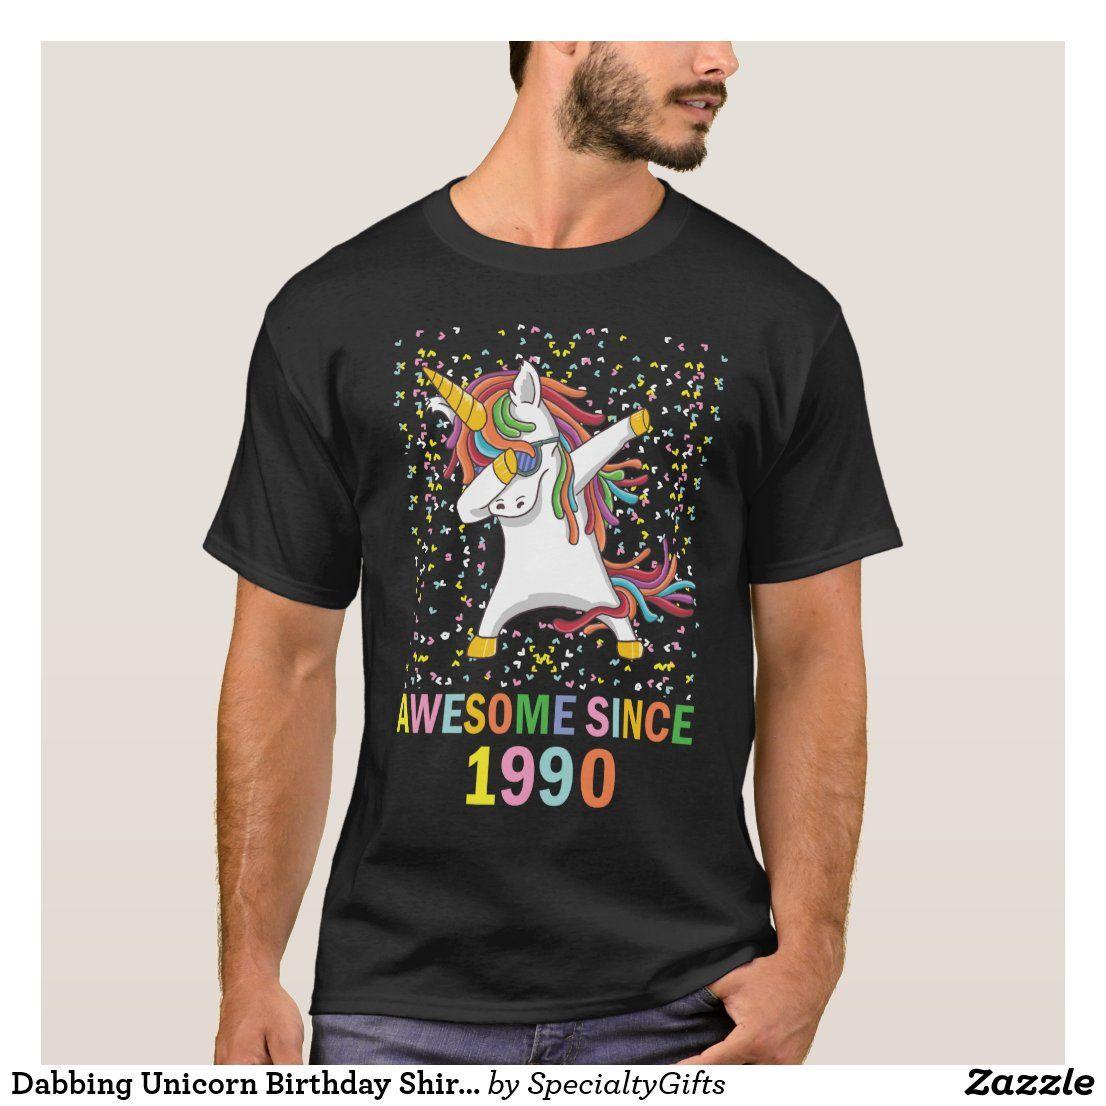 Dabbing Unicorn Birthday Shirt ,Awesome Since 1990